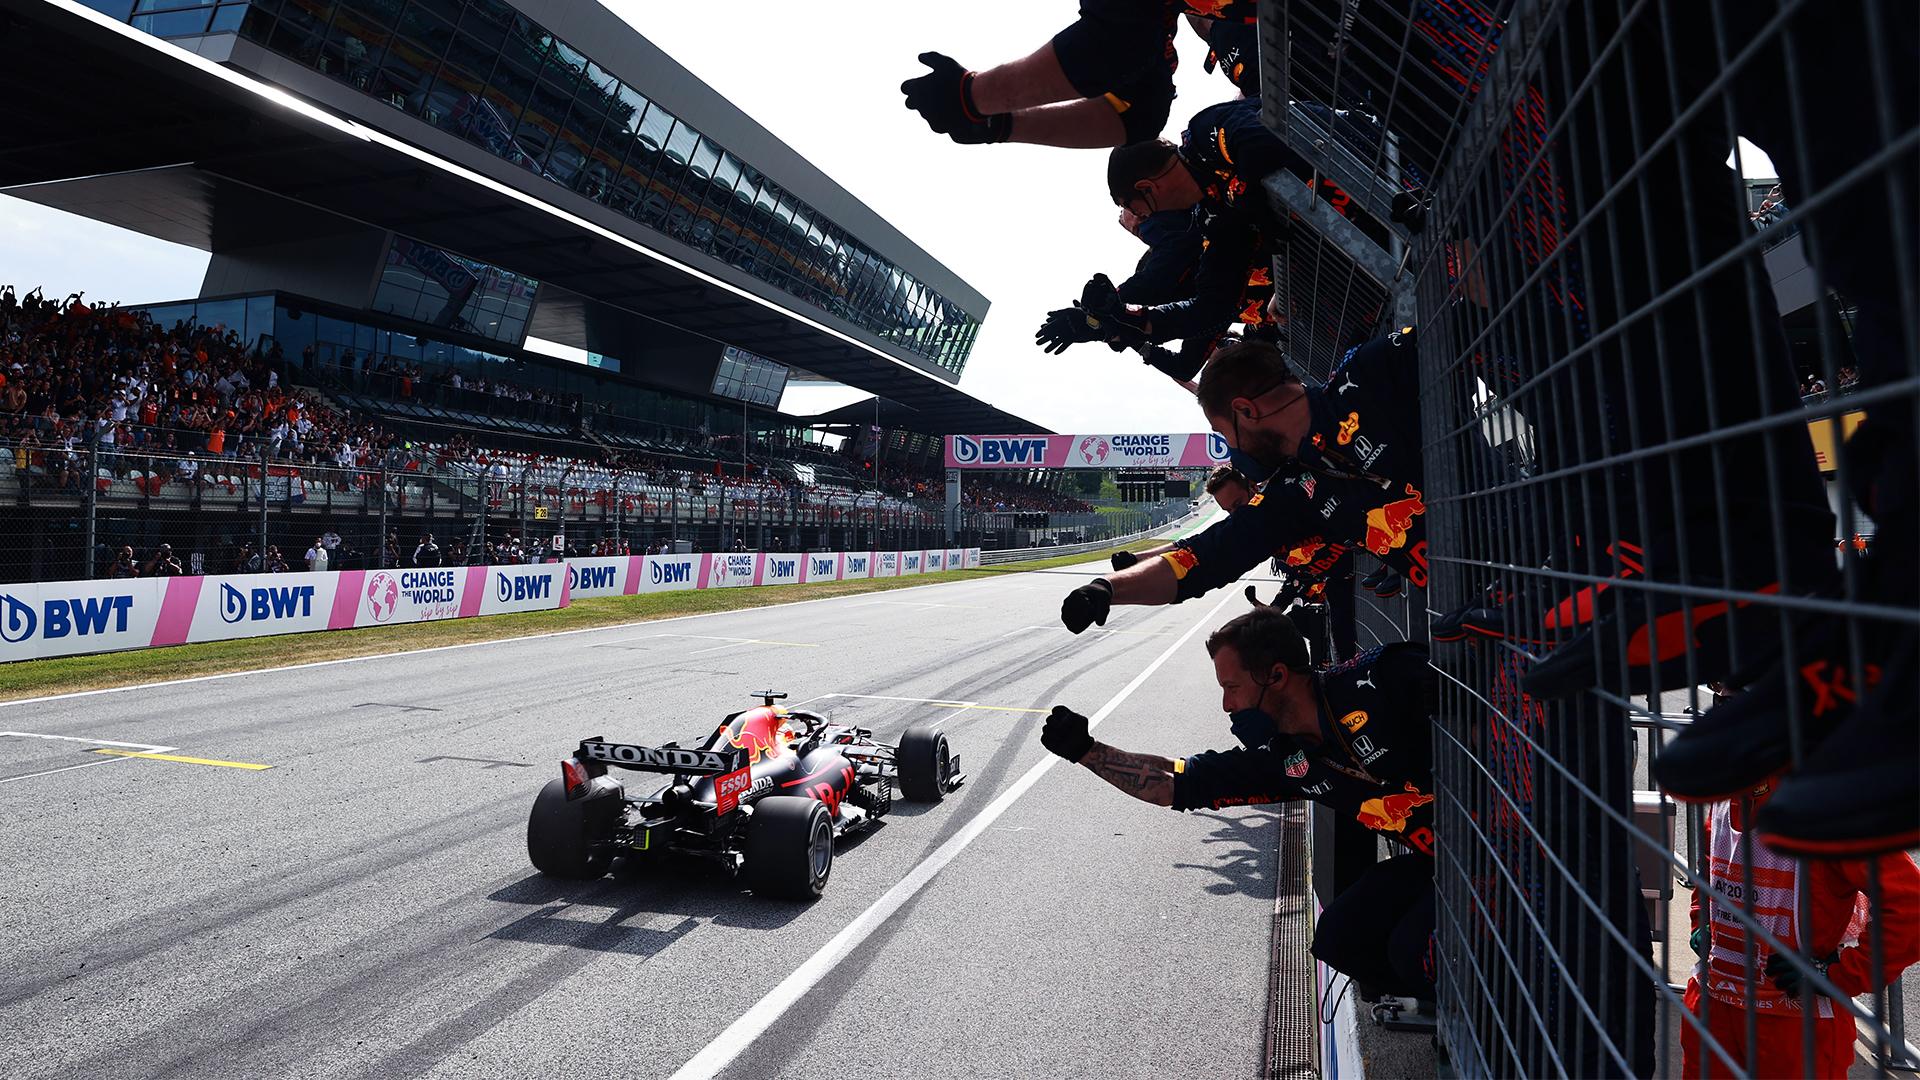 Gp d'Austria, risultati gara: Verstappen stravince, Ferrari 5° e 8°.